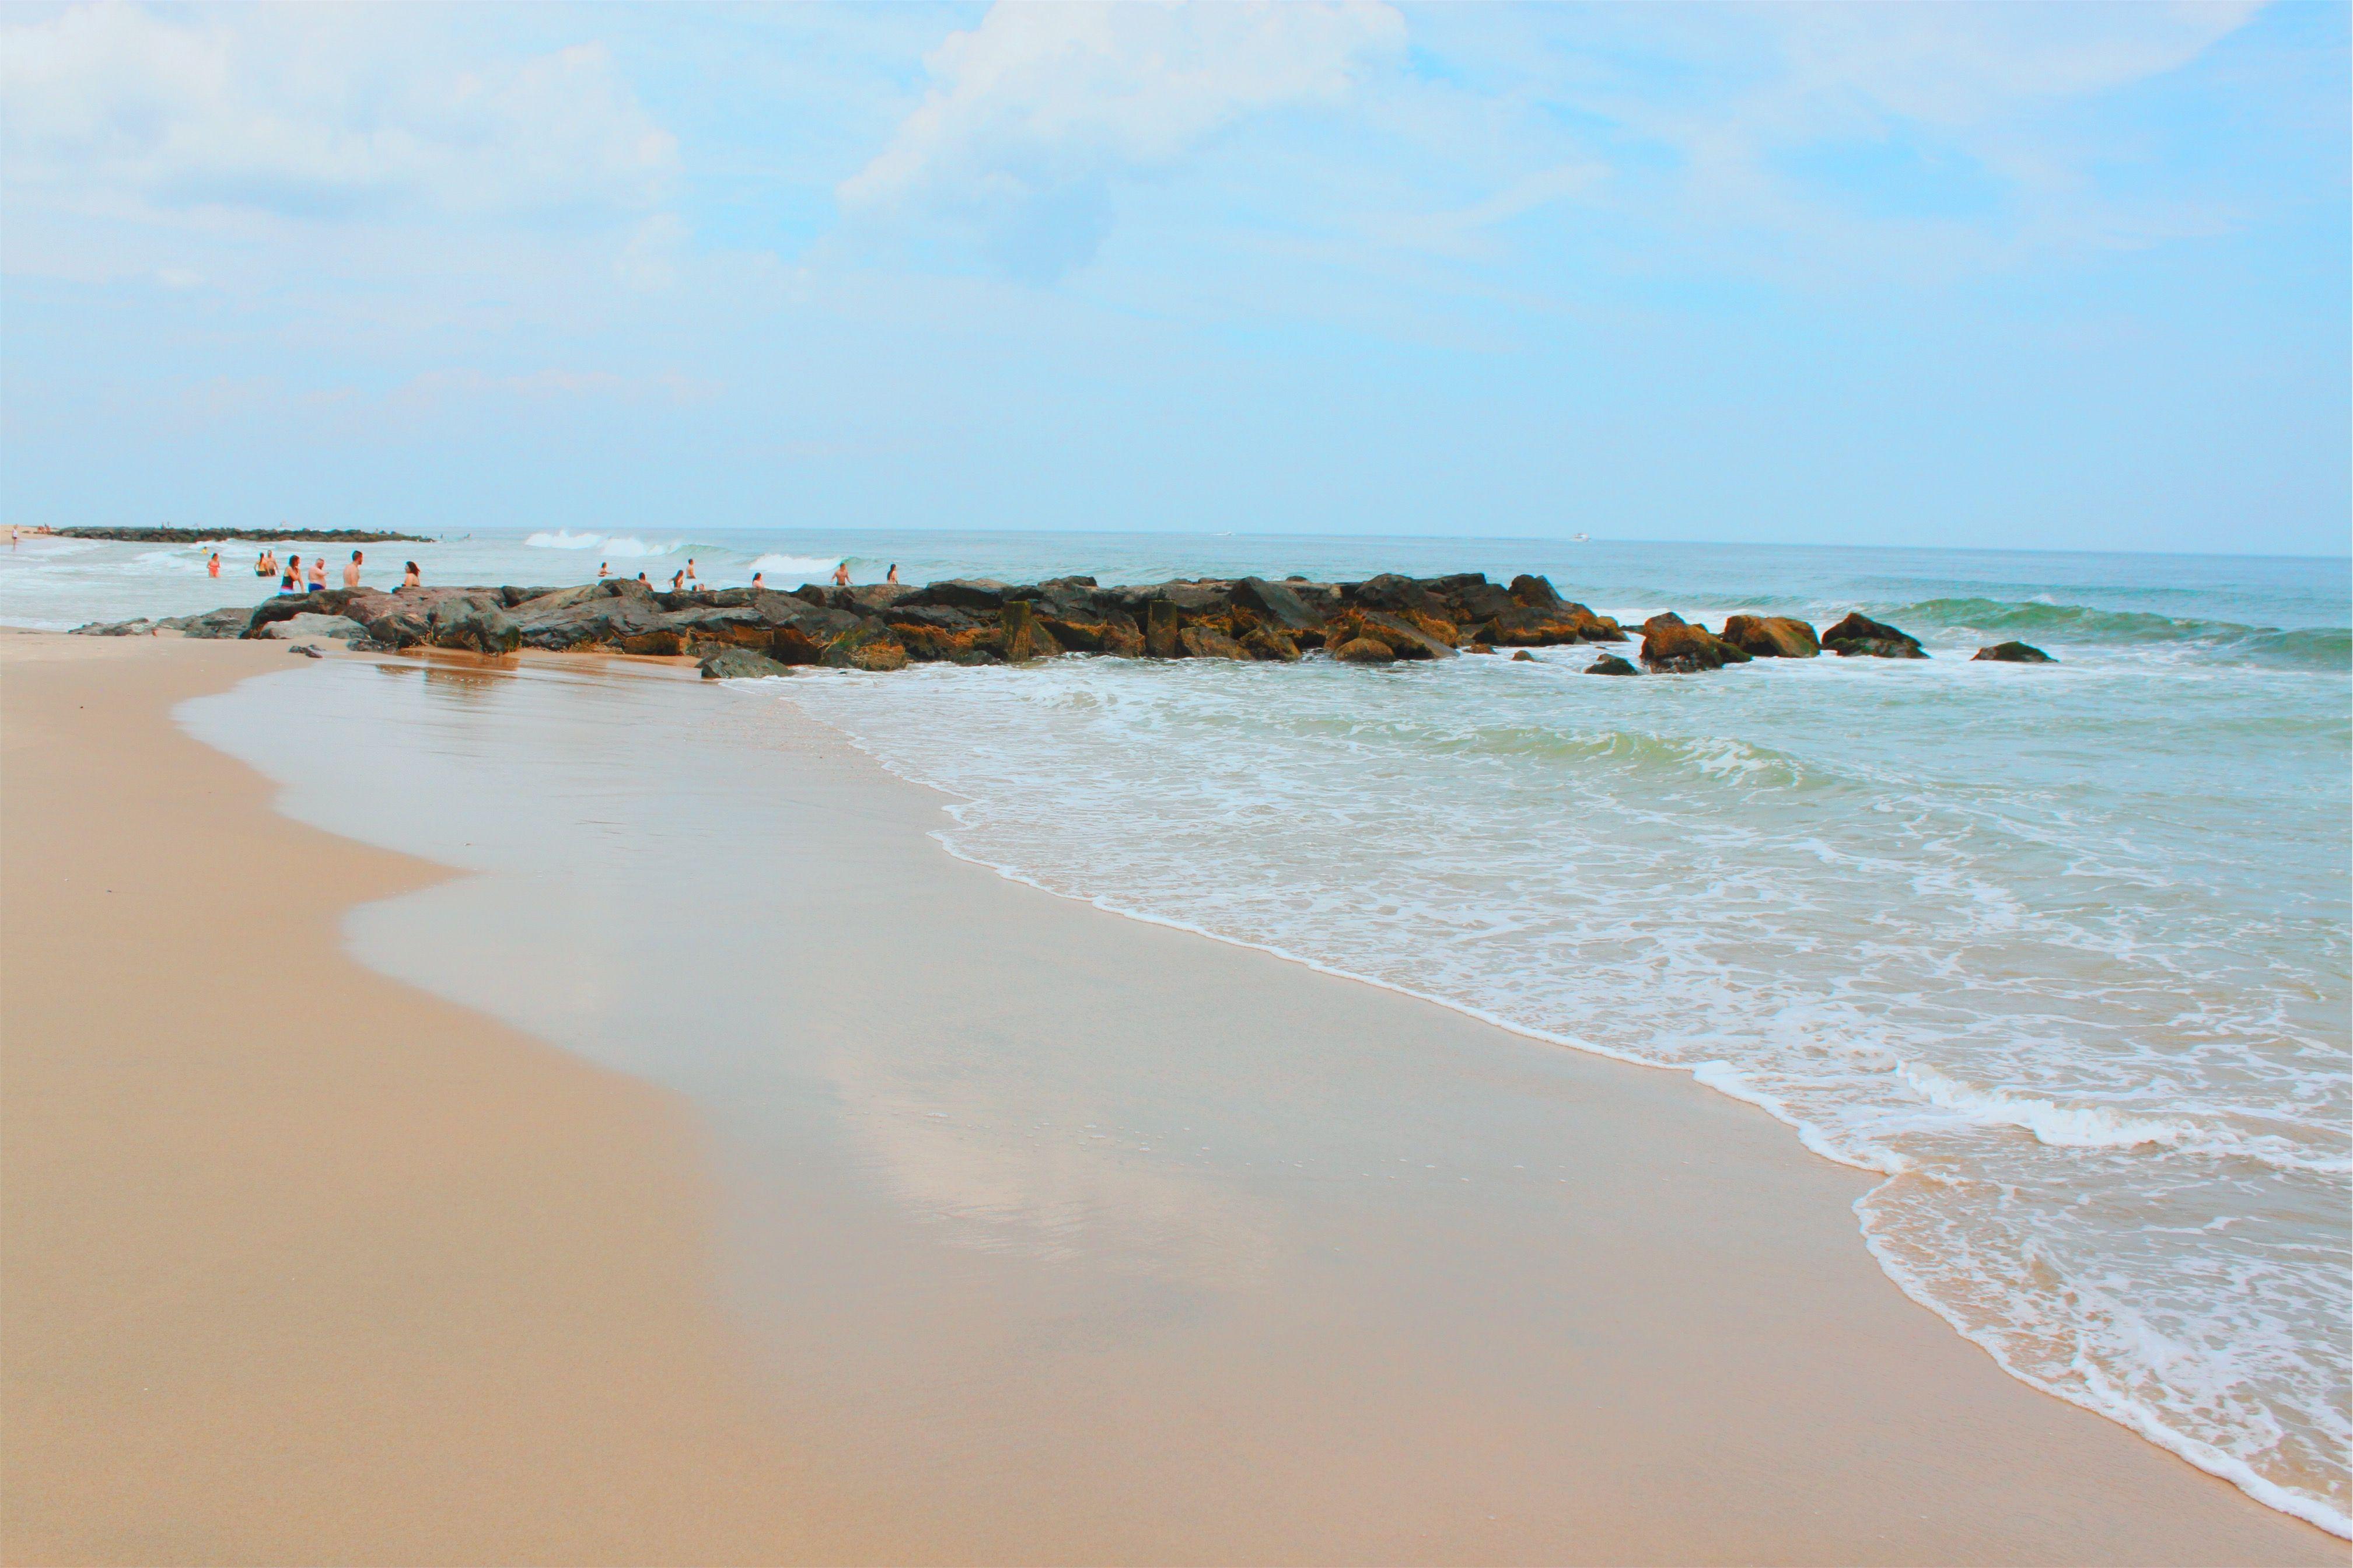 Ocean Grove, NJ Beach, ocean, vacation, summer, travel, New